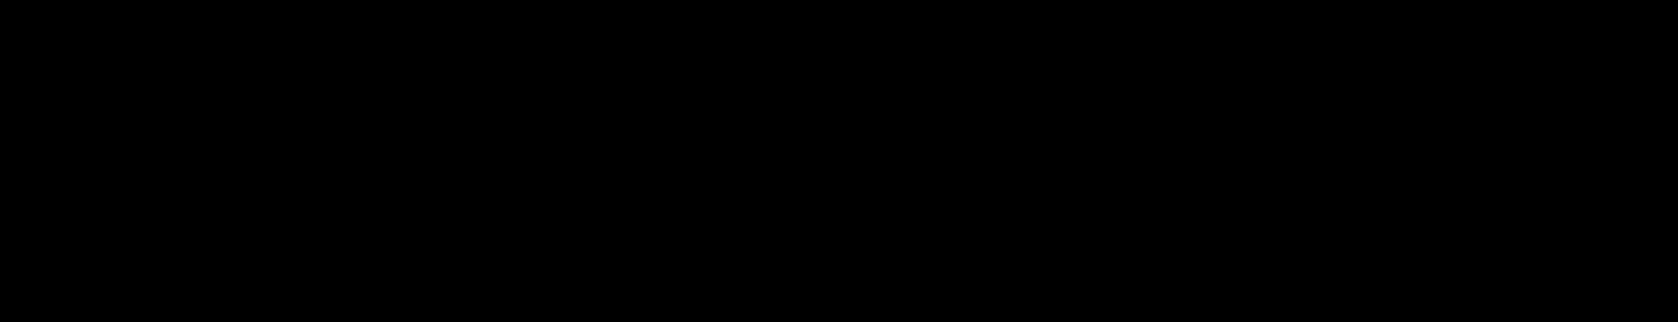 Alfred P. Sloan Foundation logo